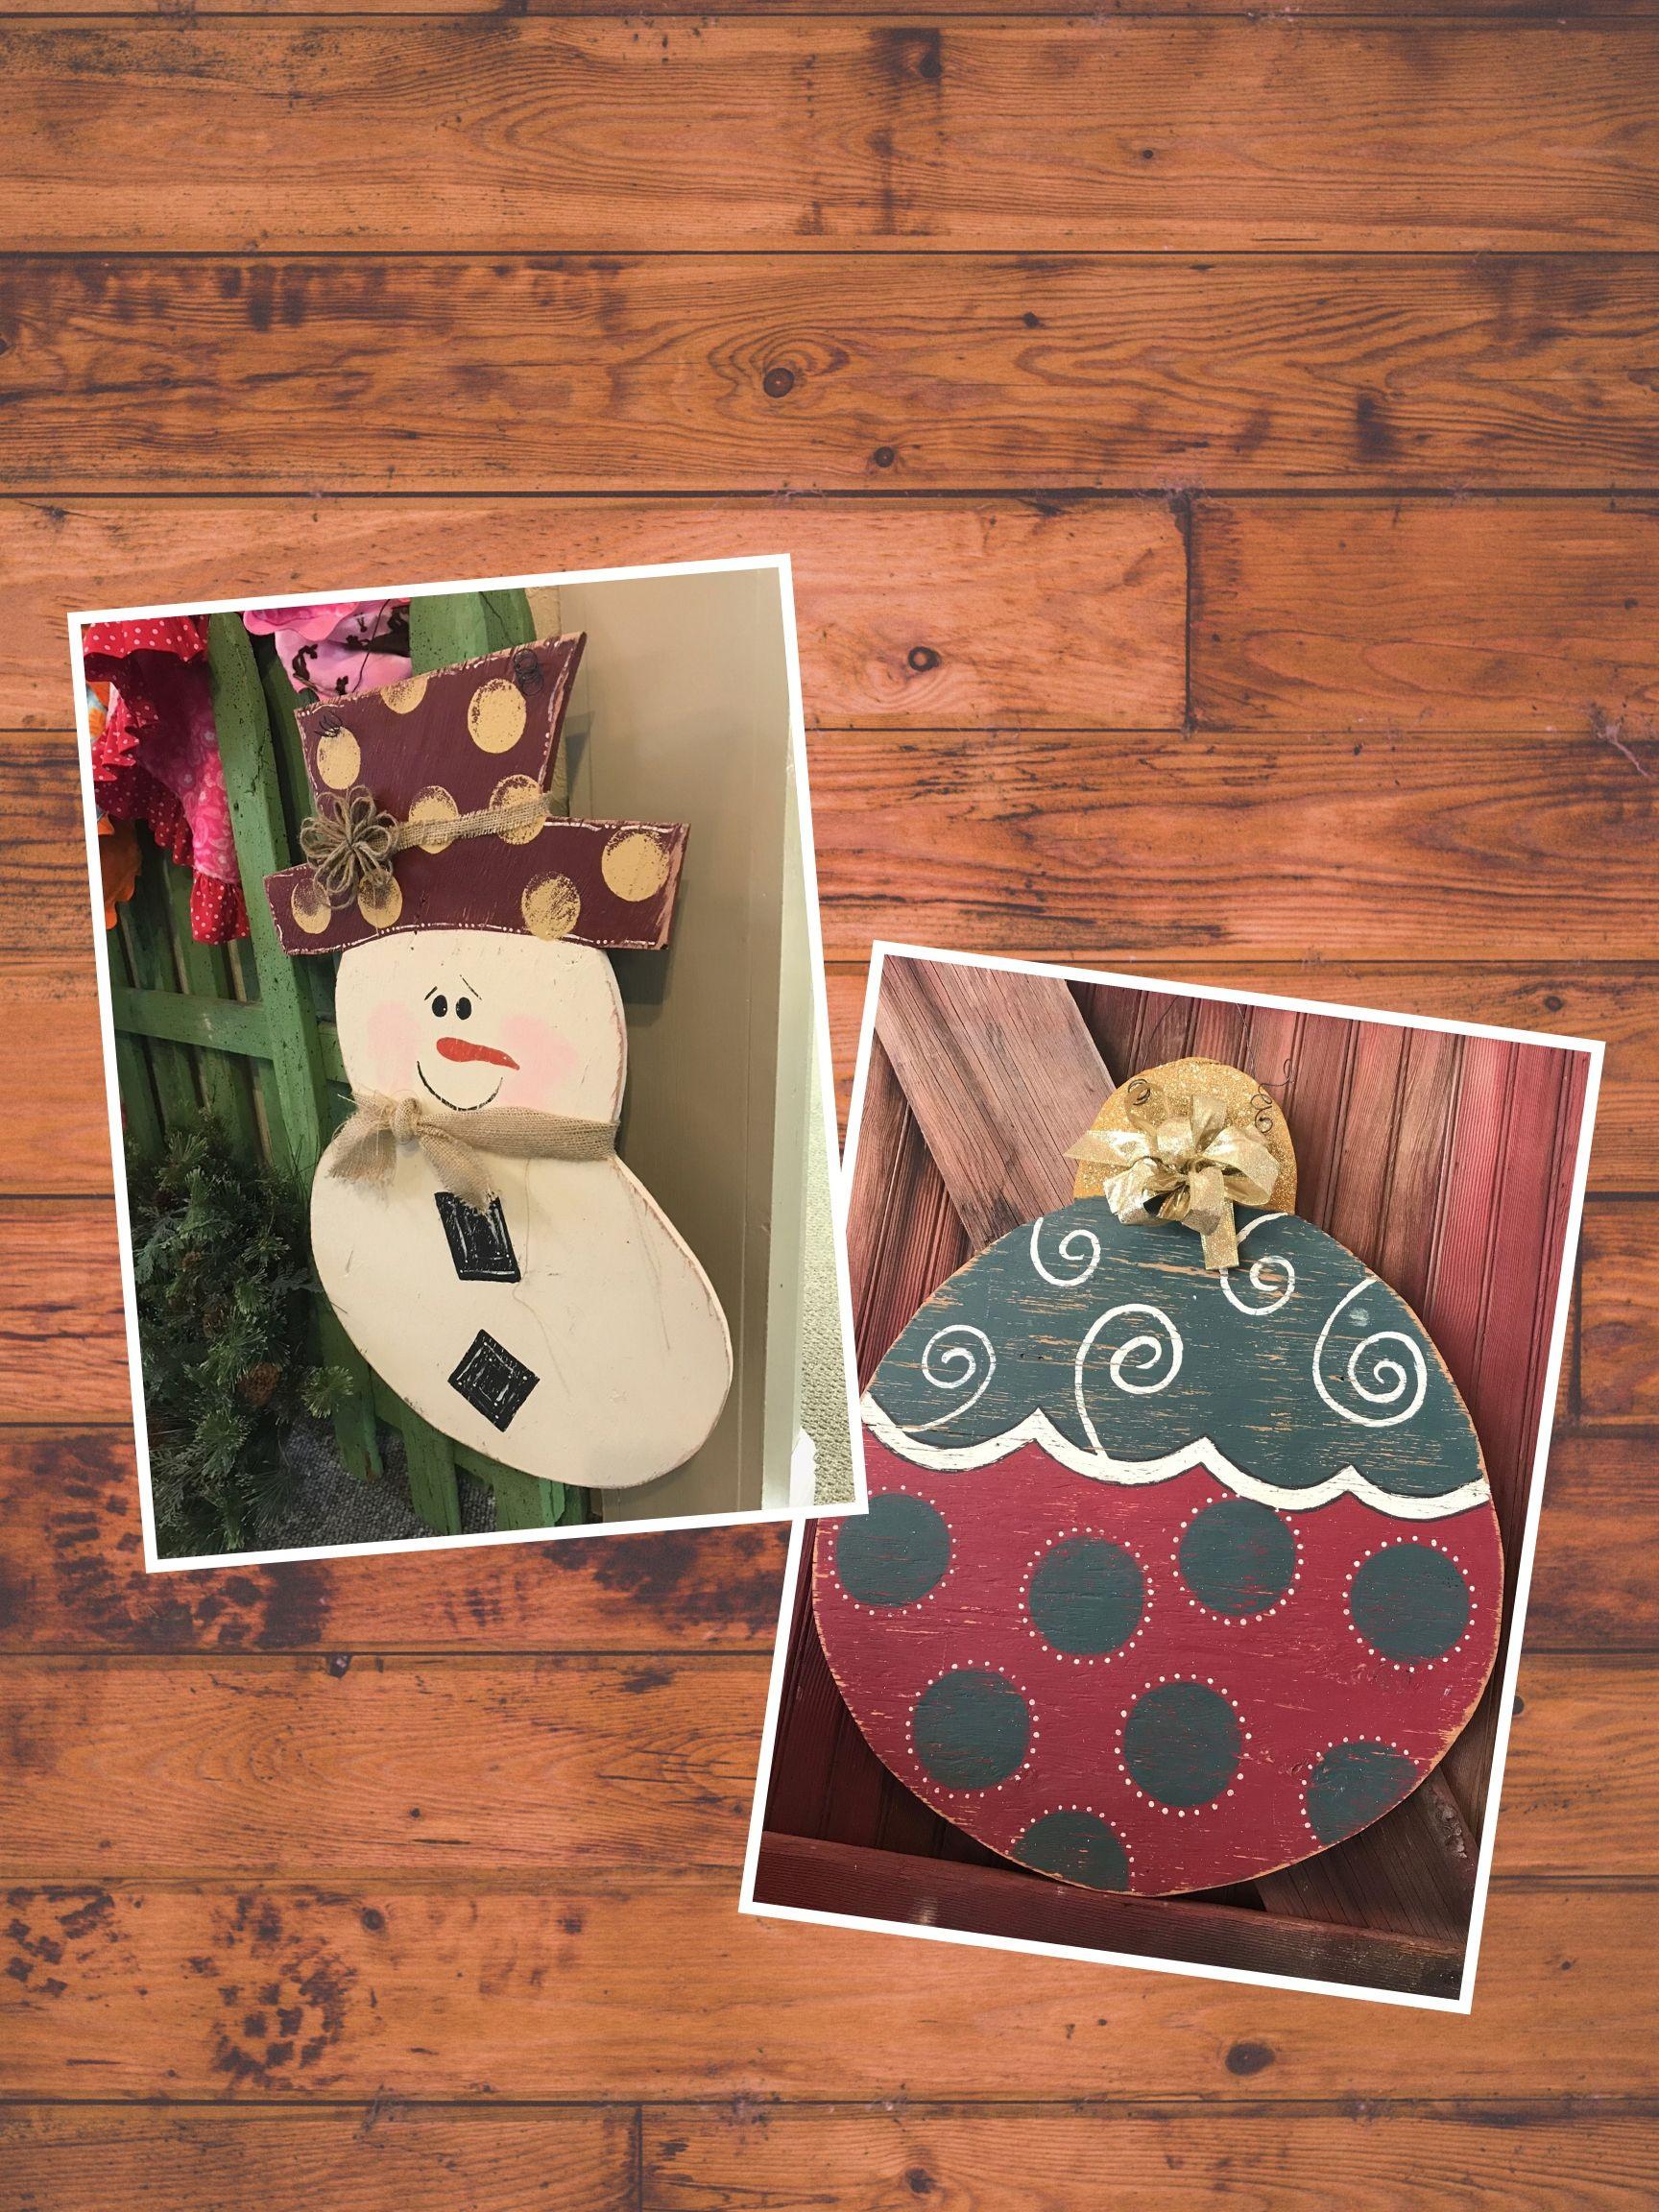 Snowman & Ornament Workshop | Dec 8